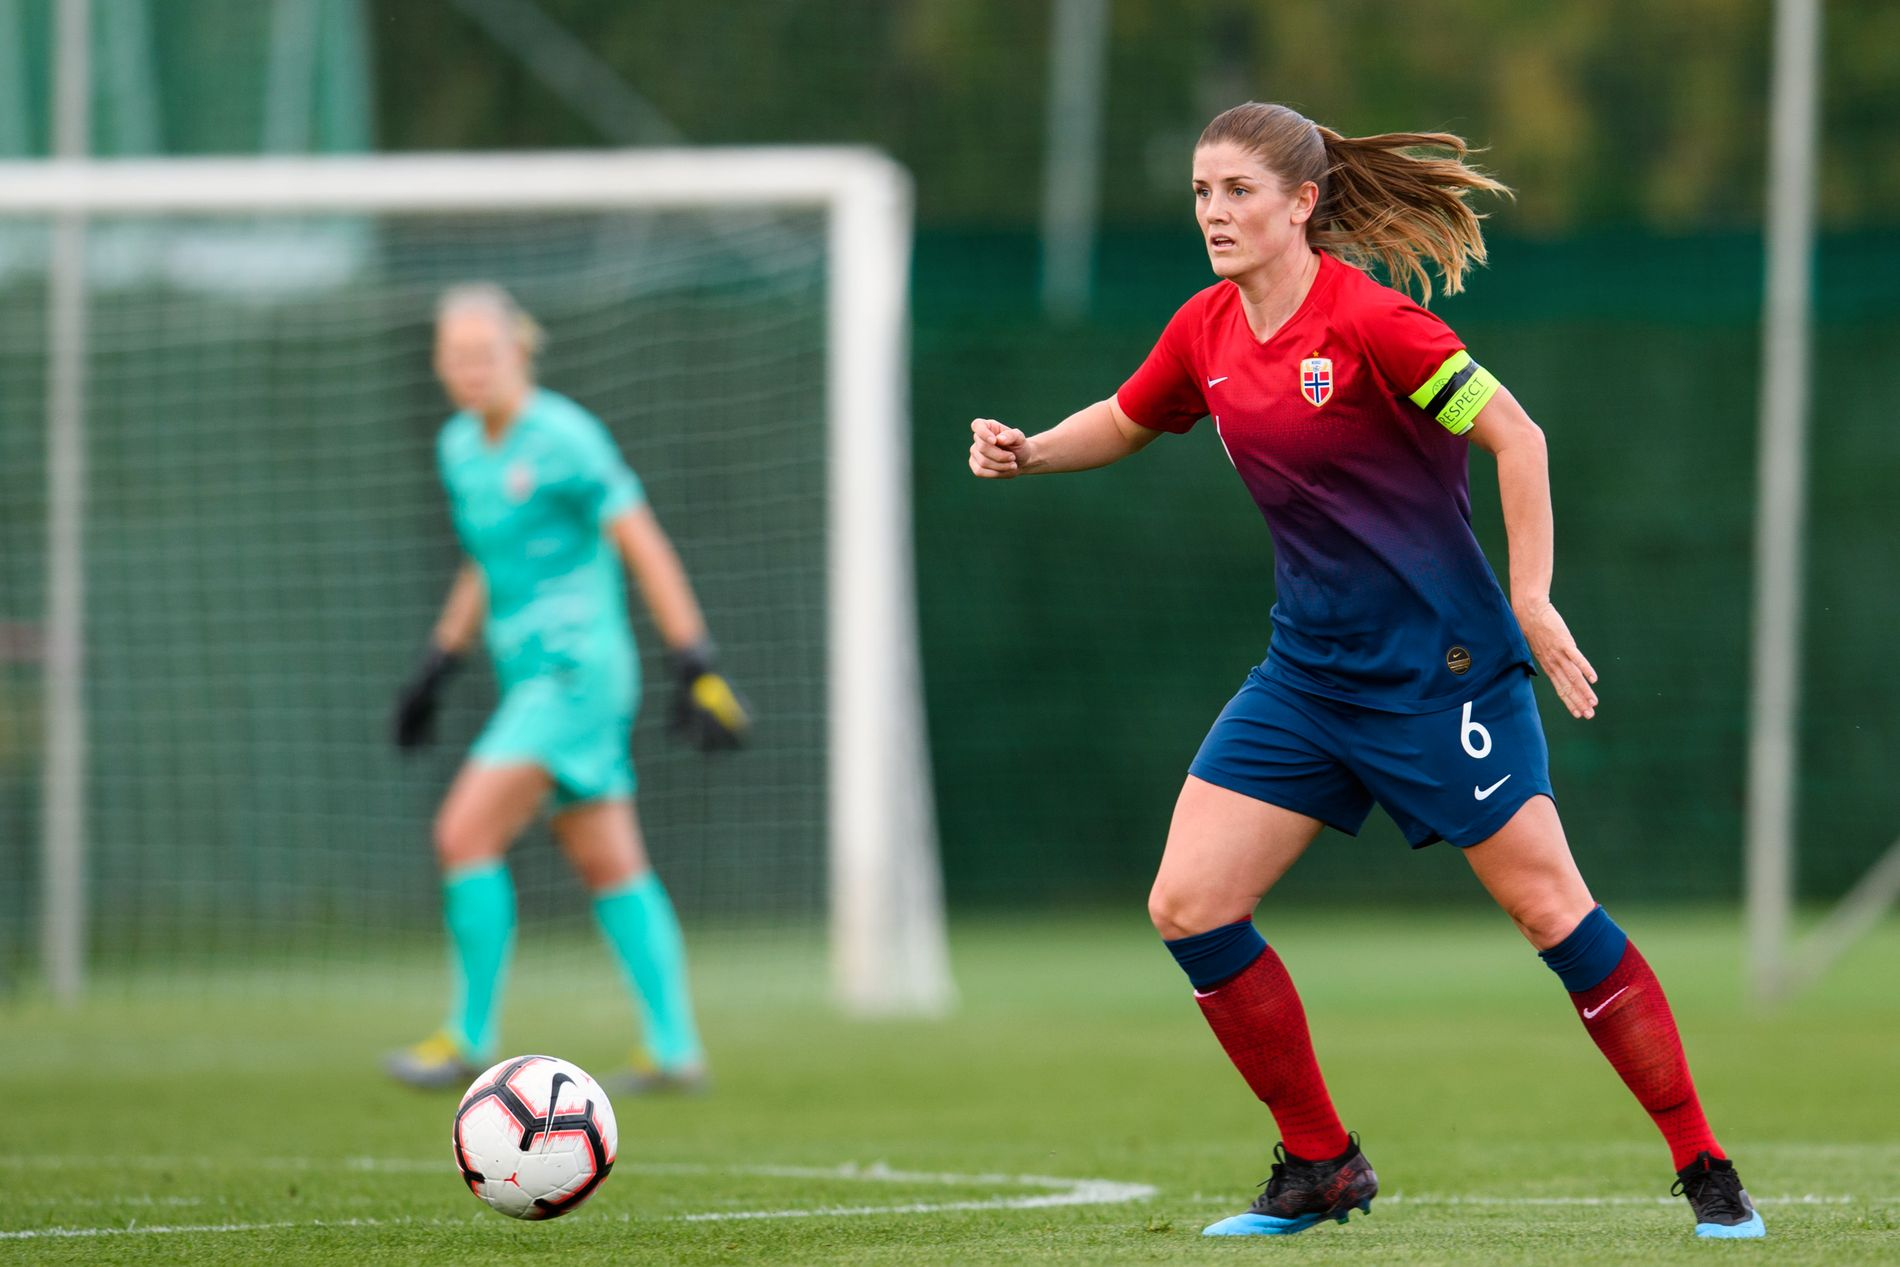 KAPTEIN: Maren Mjelde er kaptein på landslaget og var, ikke overraskende, én av Martin Sjögrens utvalgte.